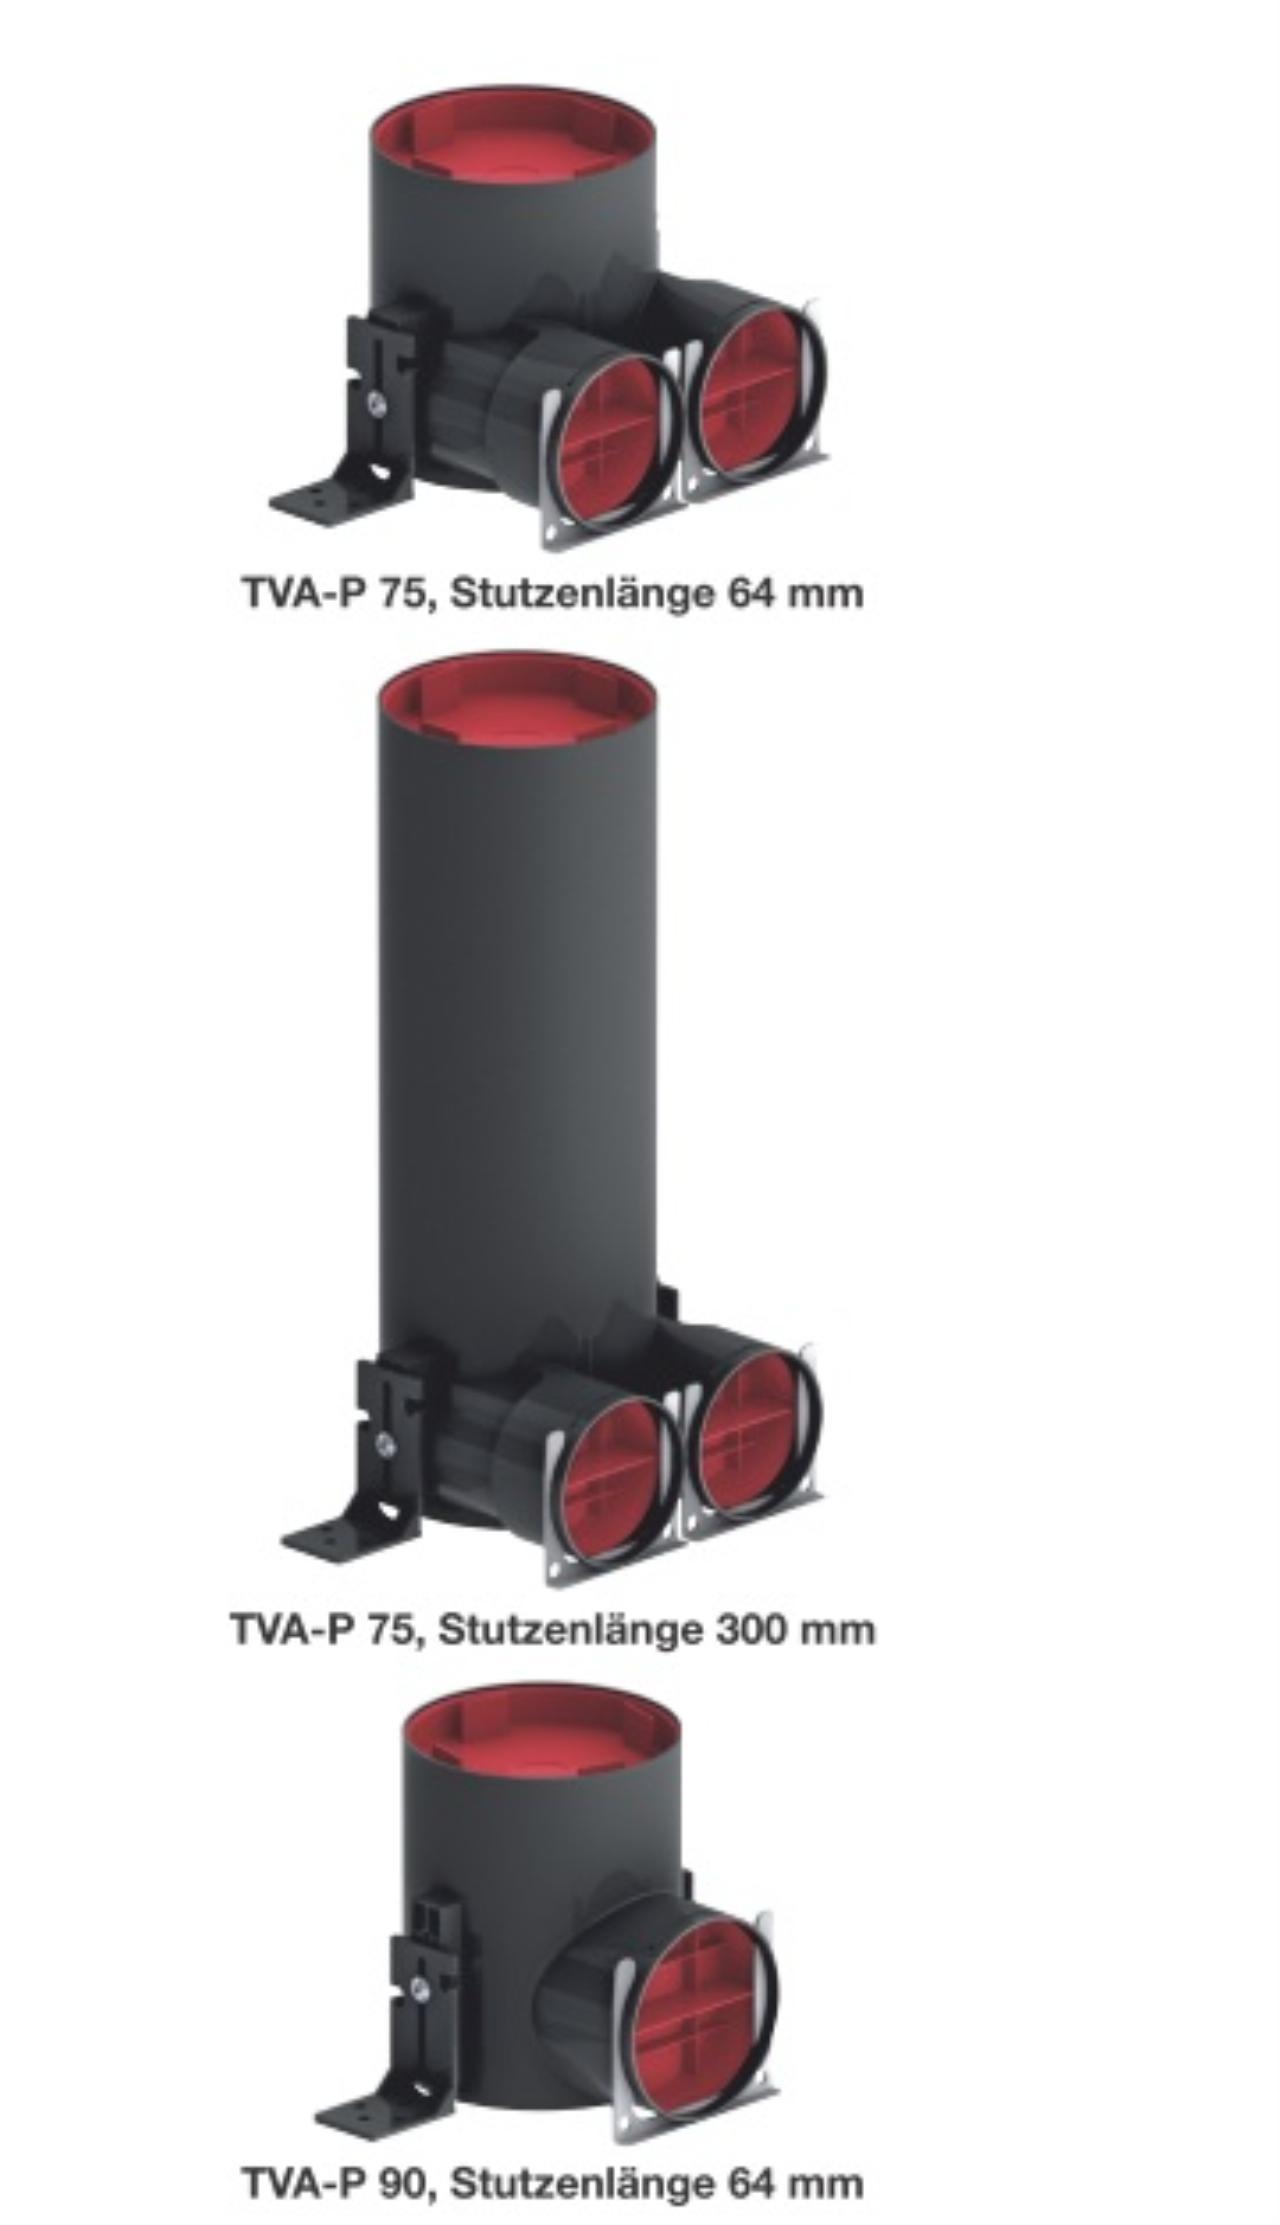 http://www.energiesparhaus.at/bilderupload2016/20161220144664.jpg